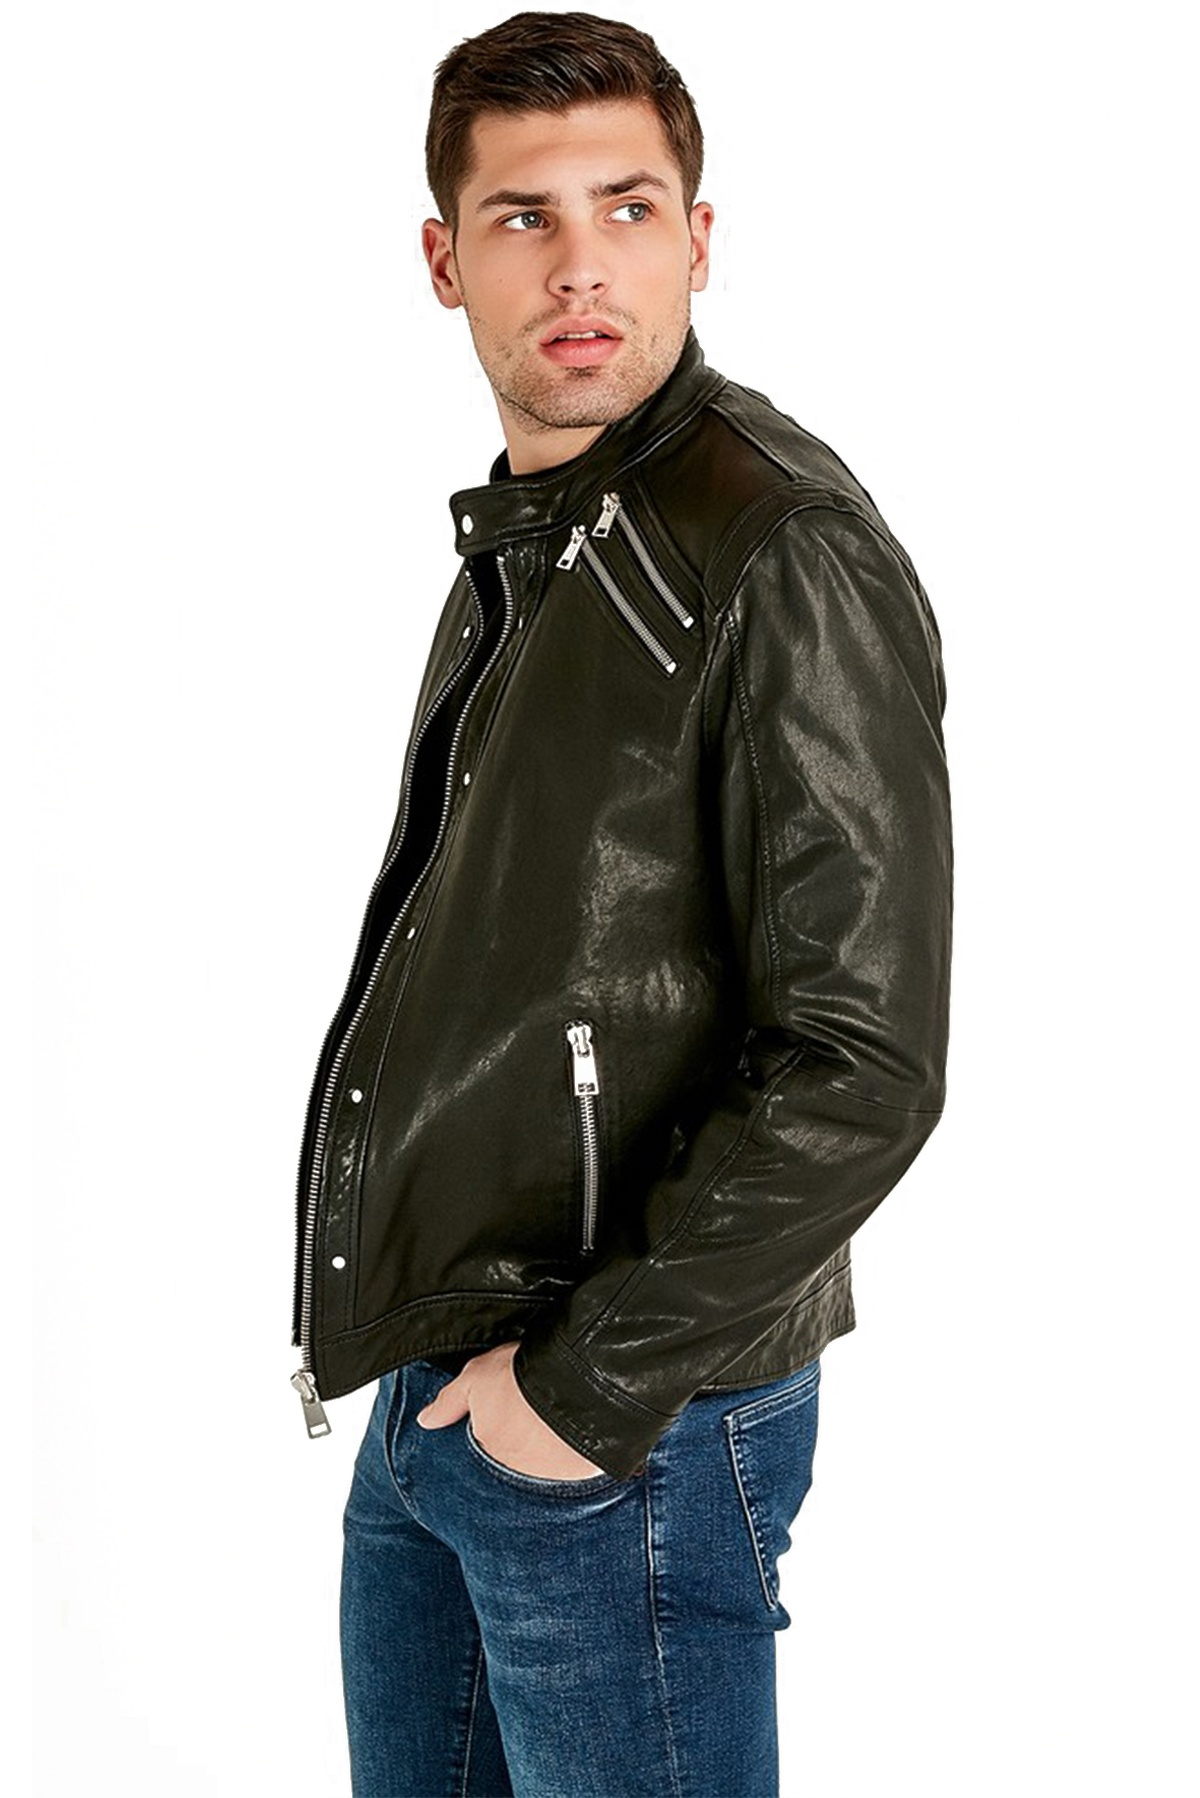 Westbrook black leather jacket